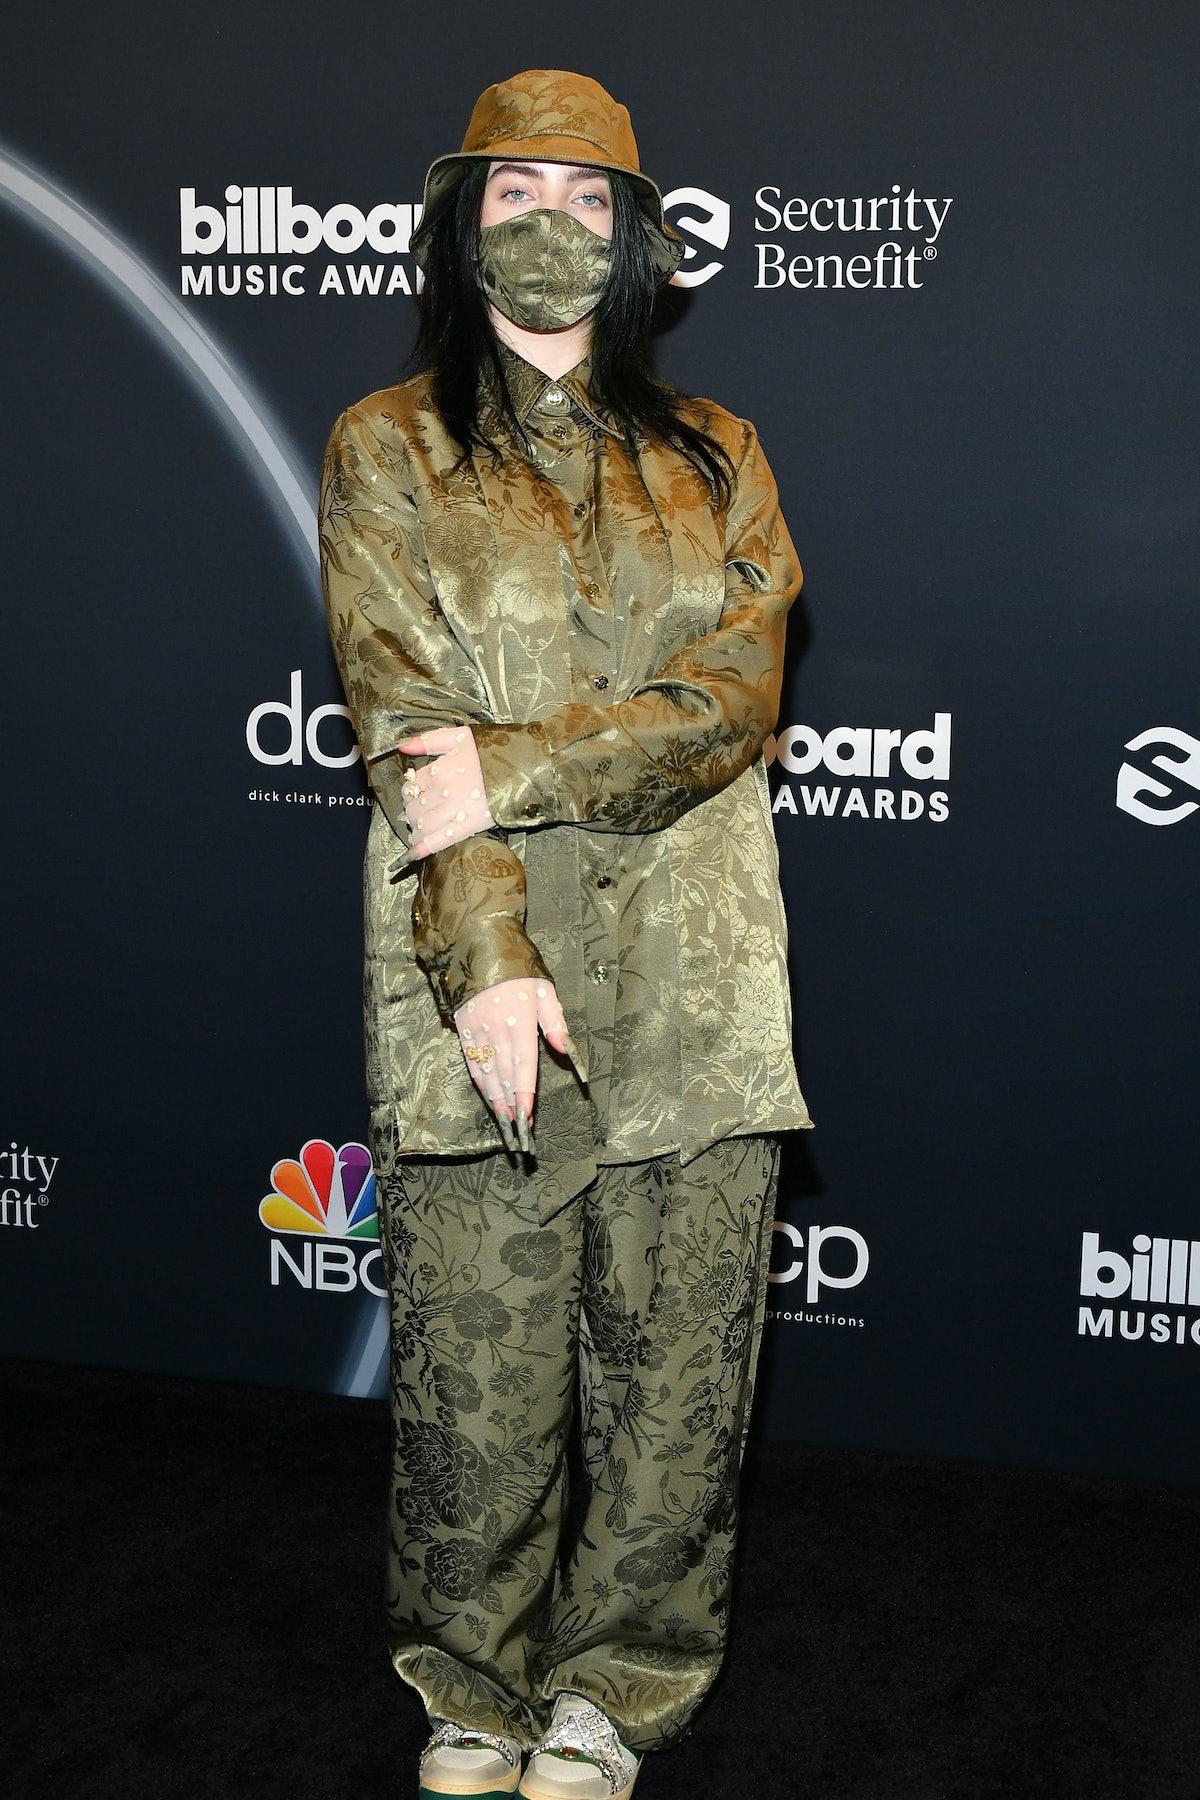 Billie Eilish poses backstage at the 2020 Billboard Music Awards, broadcast on October 14, 2020 at t...